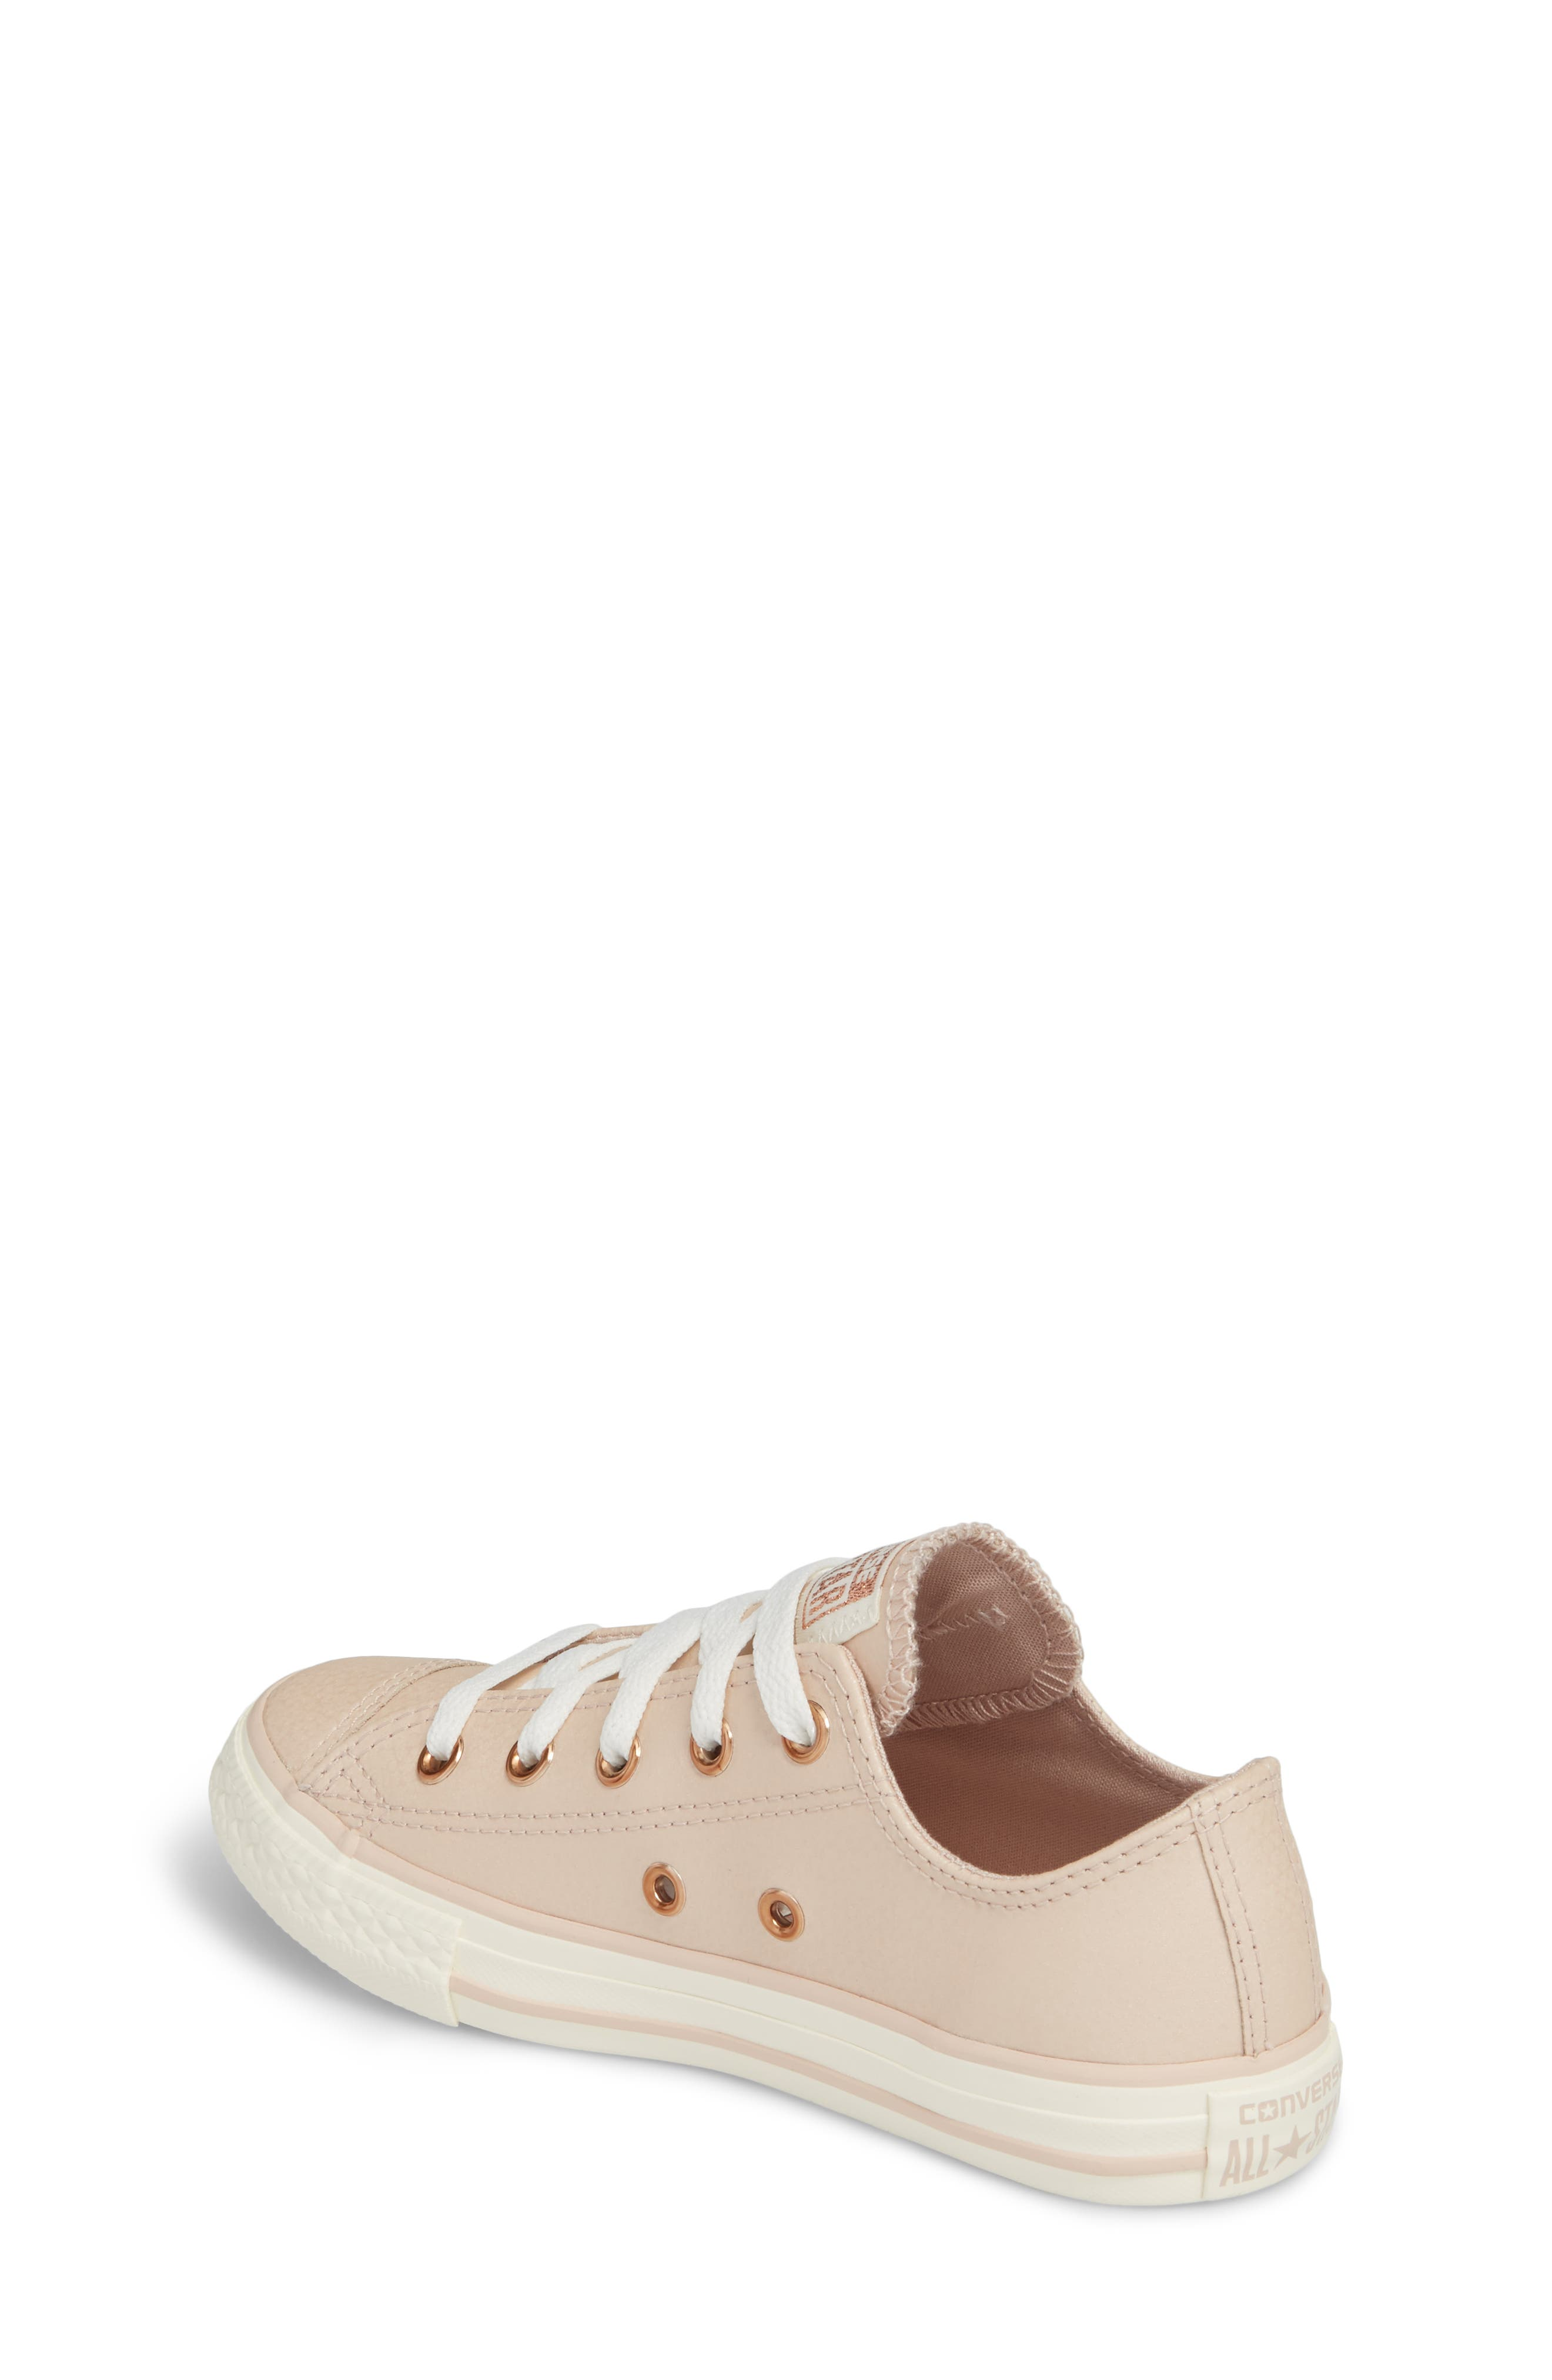 Alternate Image 2  - Converse All Star® Fashion Low Top Sneaker (Toddler, Little Kid & Big Kid)